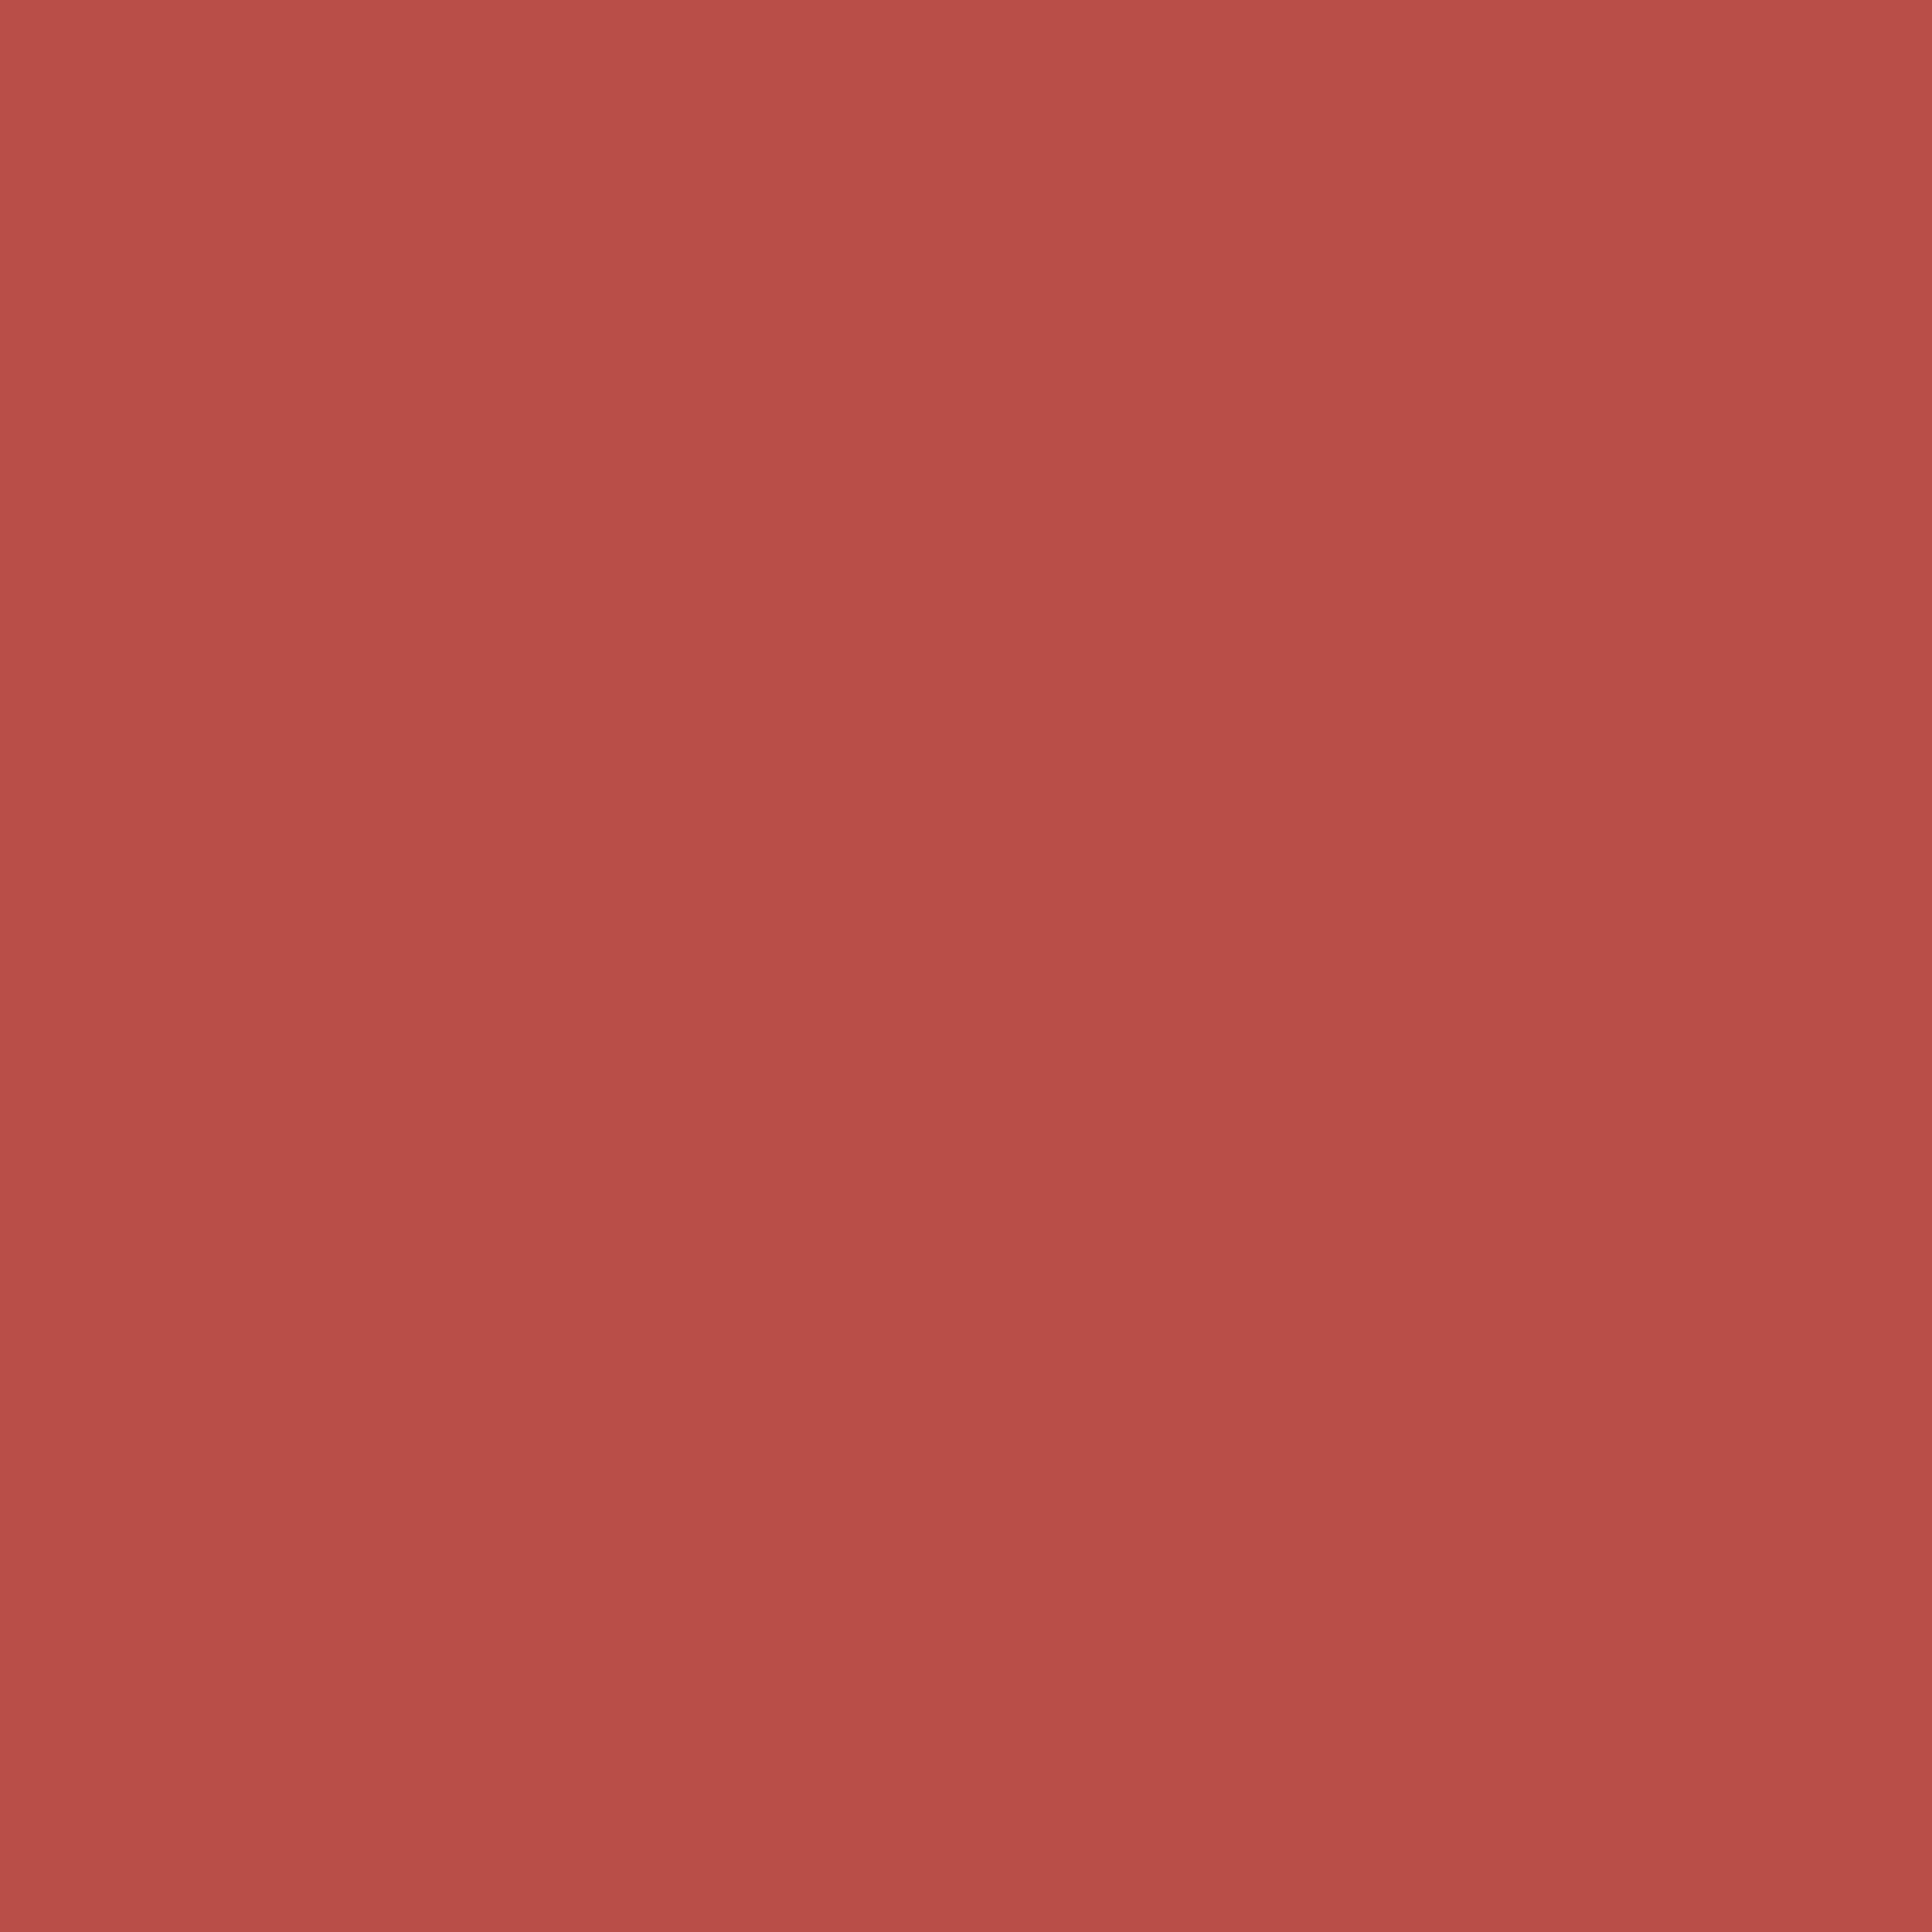 3600x3600 Deep Chestnut Solid Color Background